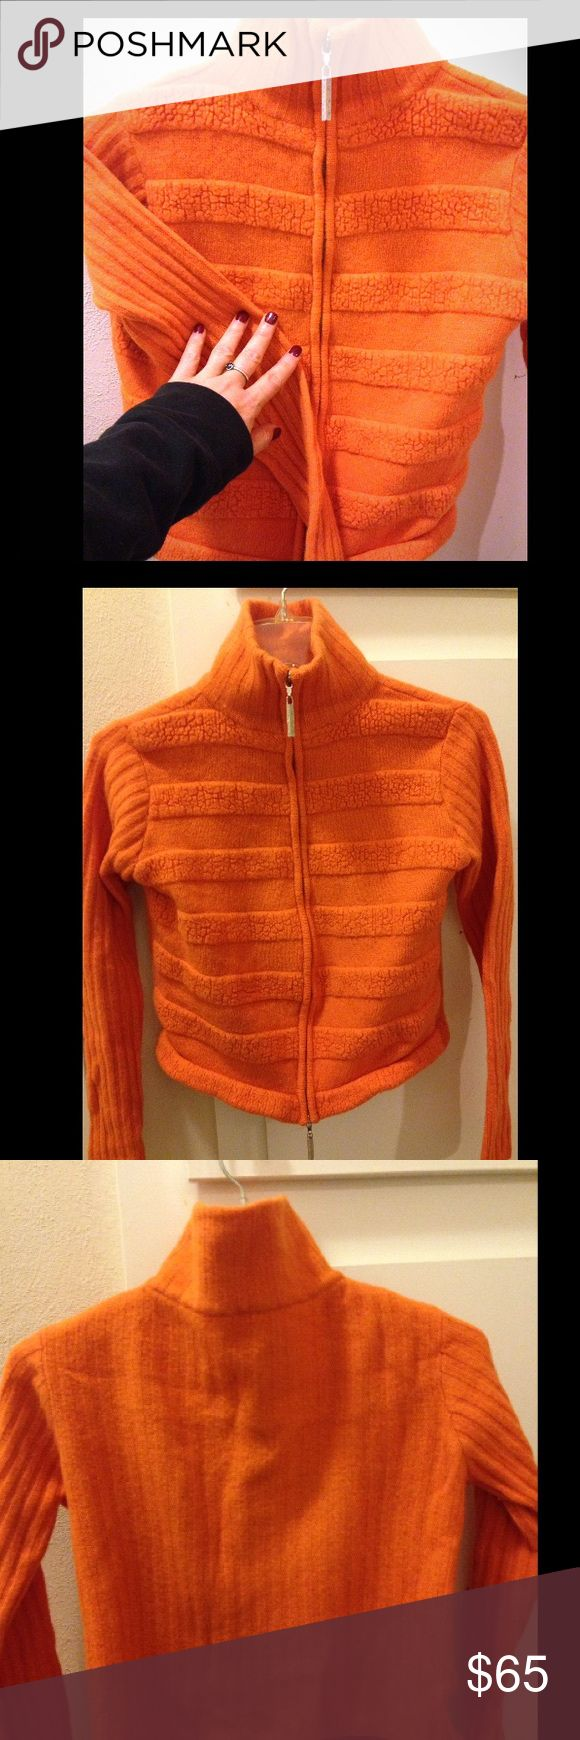 Versace Women's Comfortable Orange ZipUp Sweater M Versace Women's Comfortable & Soft Orange Zip Up Sweater, Size (M) Made in Italy, Very Nice! Versace Sweaters